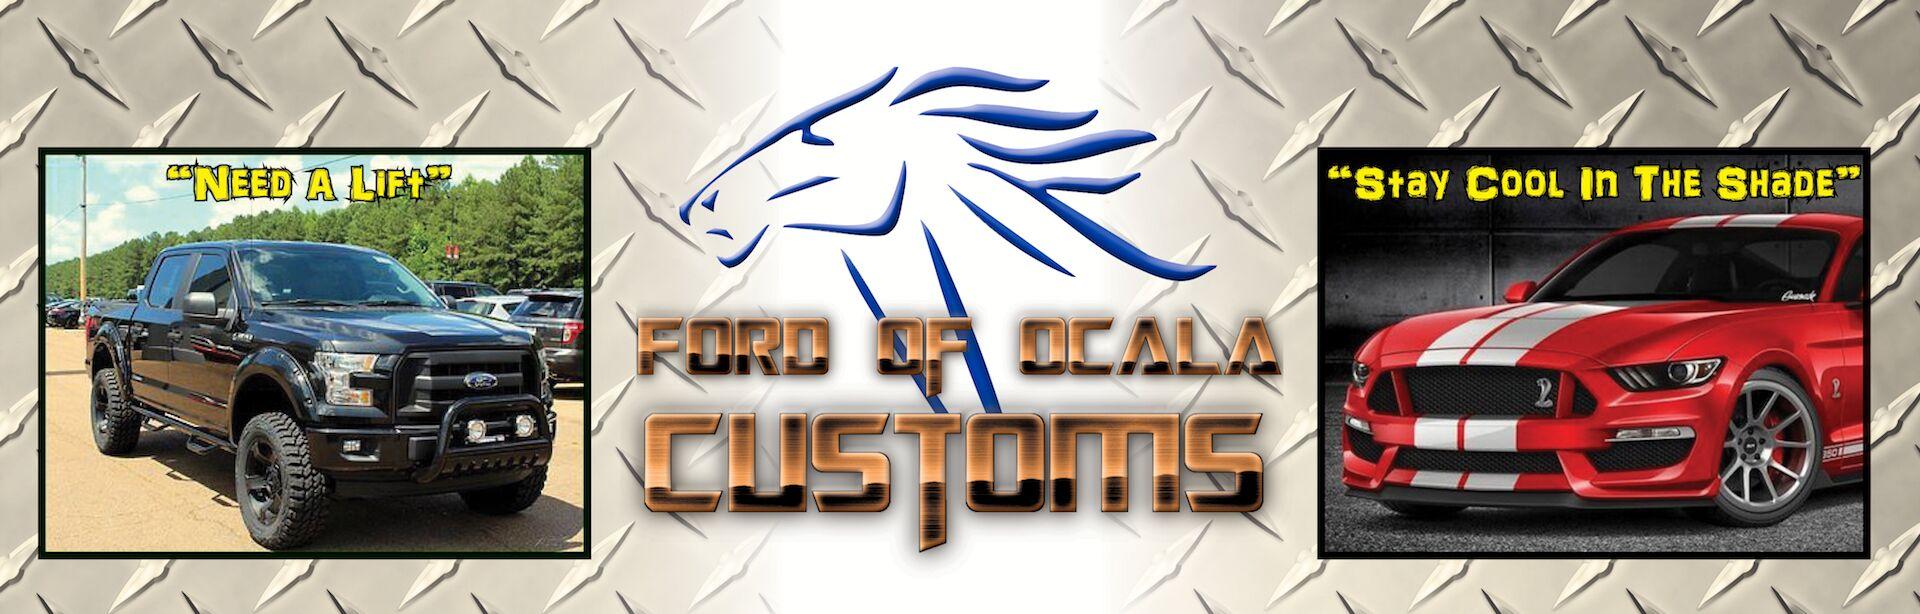 Ford Ocala Customs